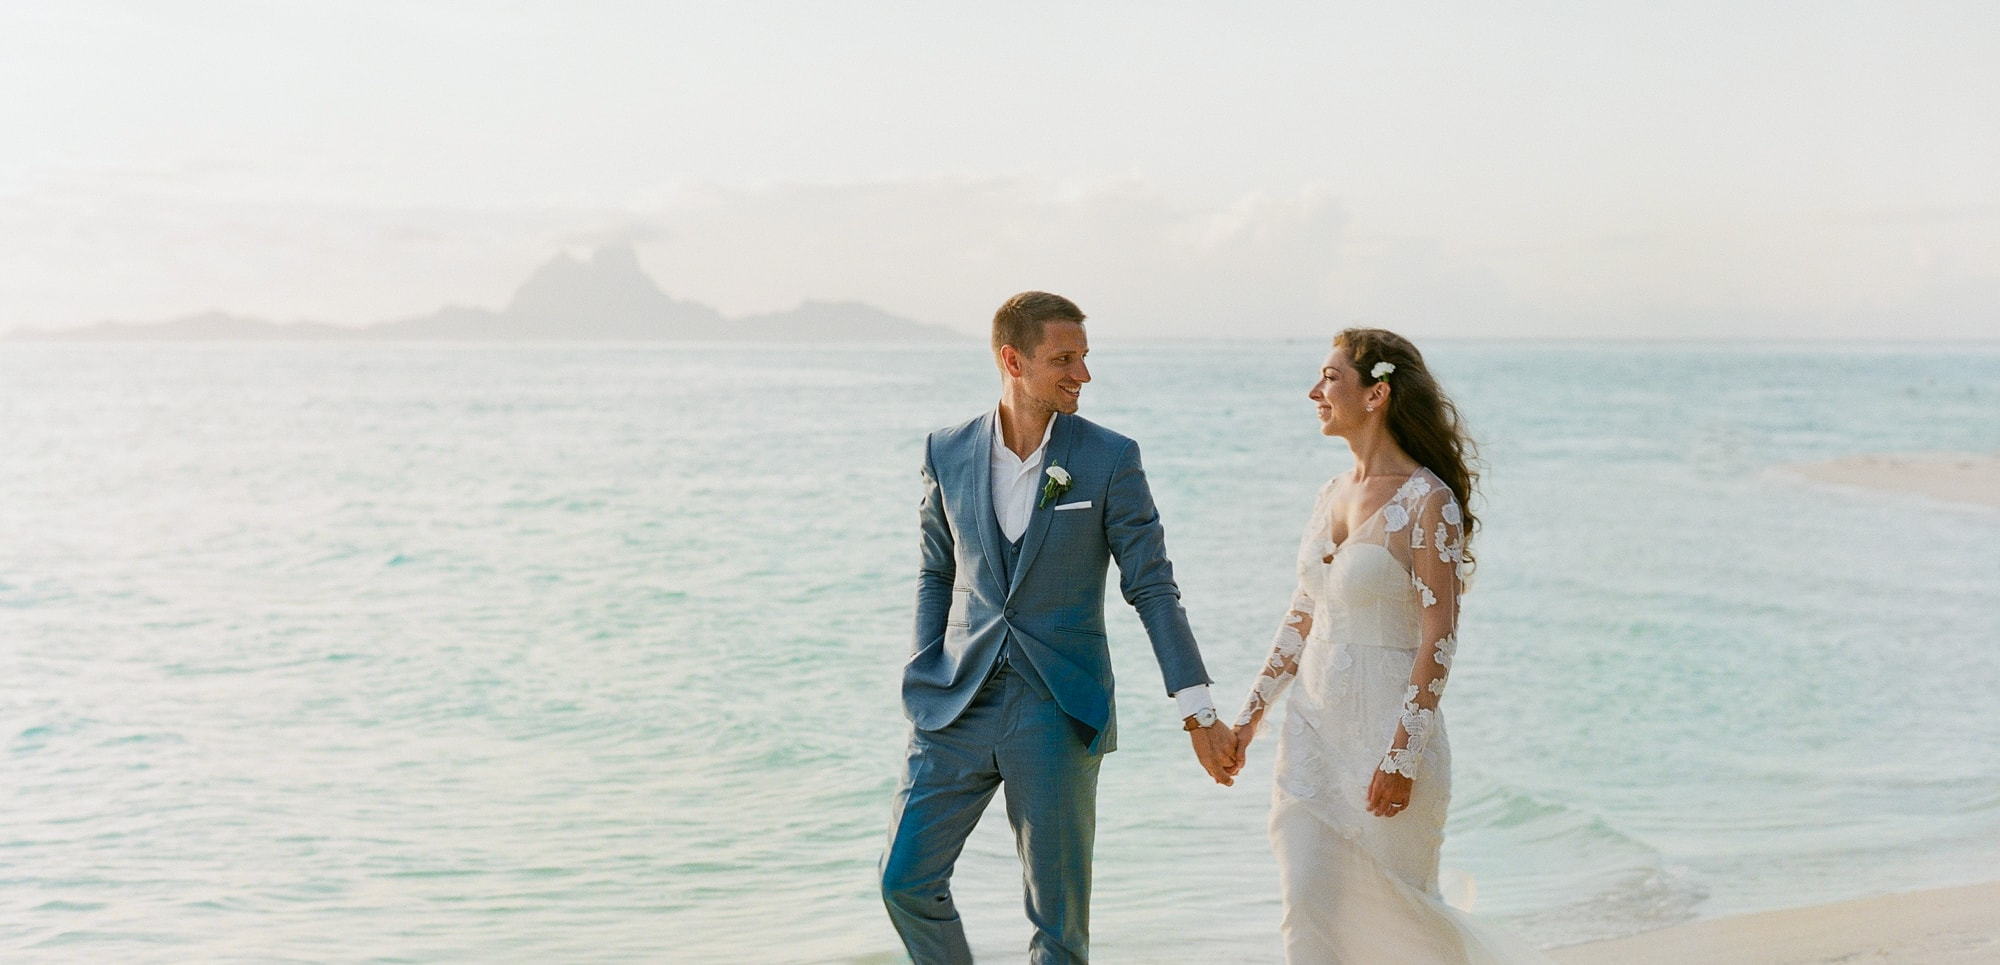 https://tahititourisme.com.br/wp-content/uploads/2021/04/PCP-Bora-Bora-Photography-Couple-Wedding-sunset.jpg